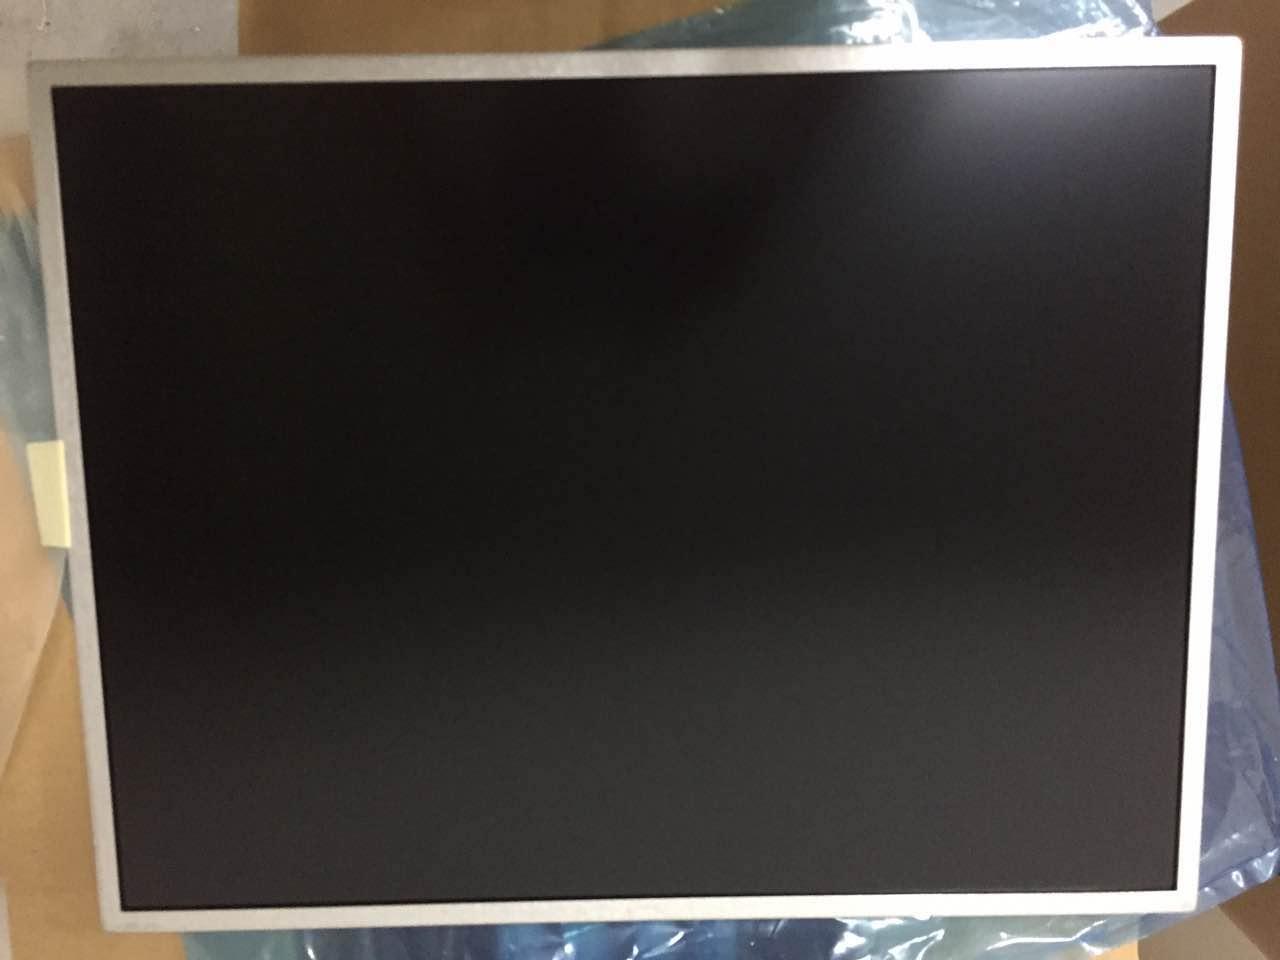 G213QAN01.0 AUO LCD PANEL